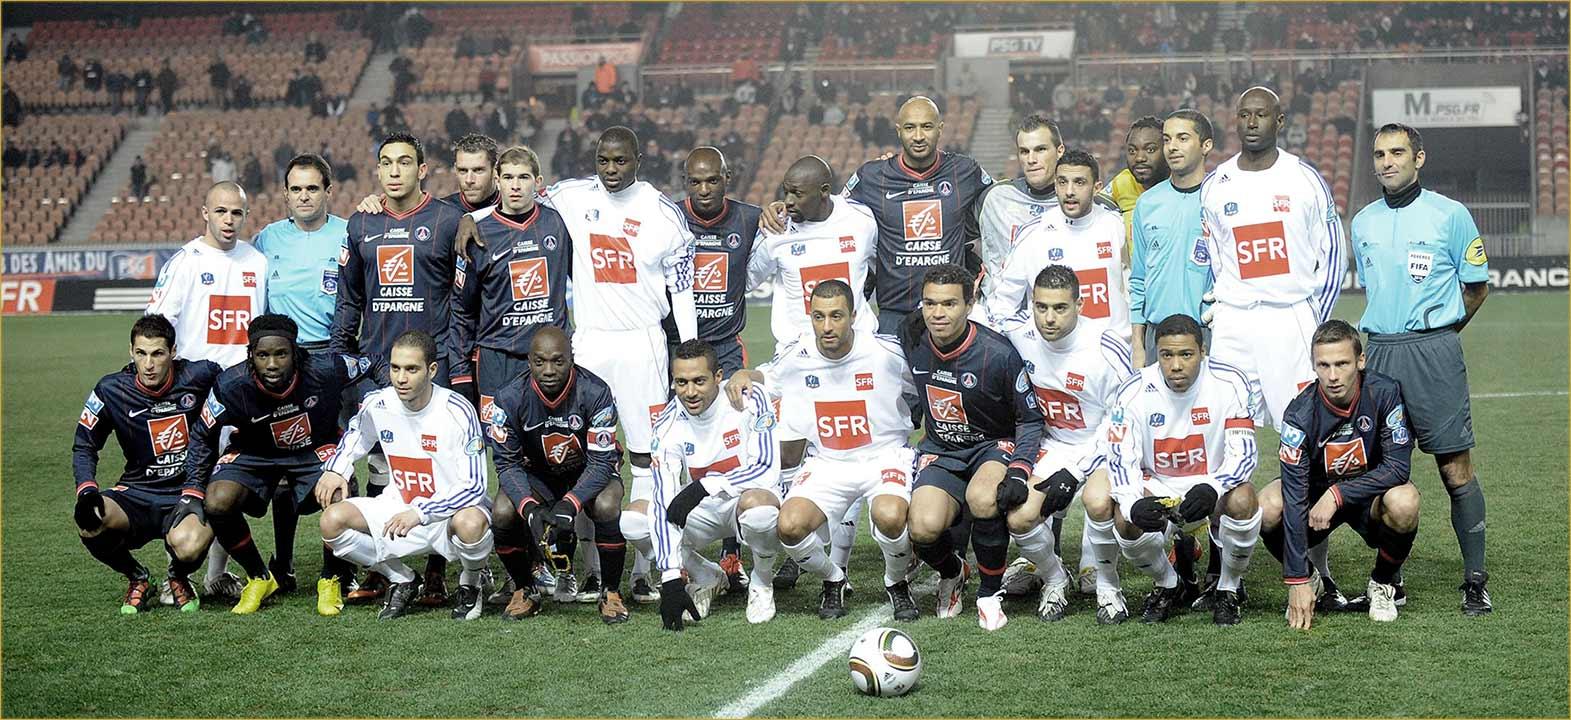 PSG Aubervilliers 2010 Virage